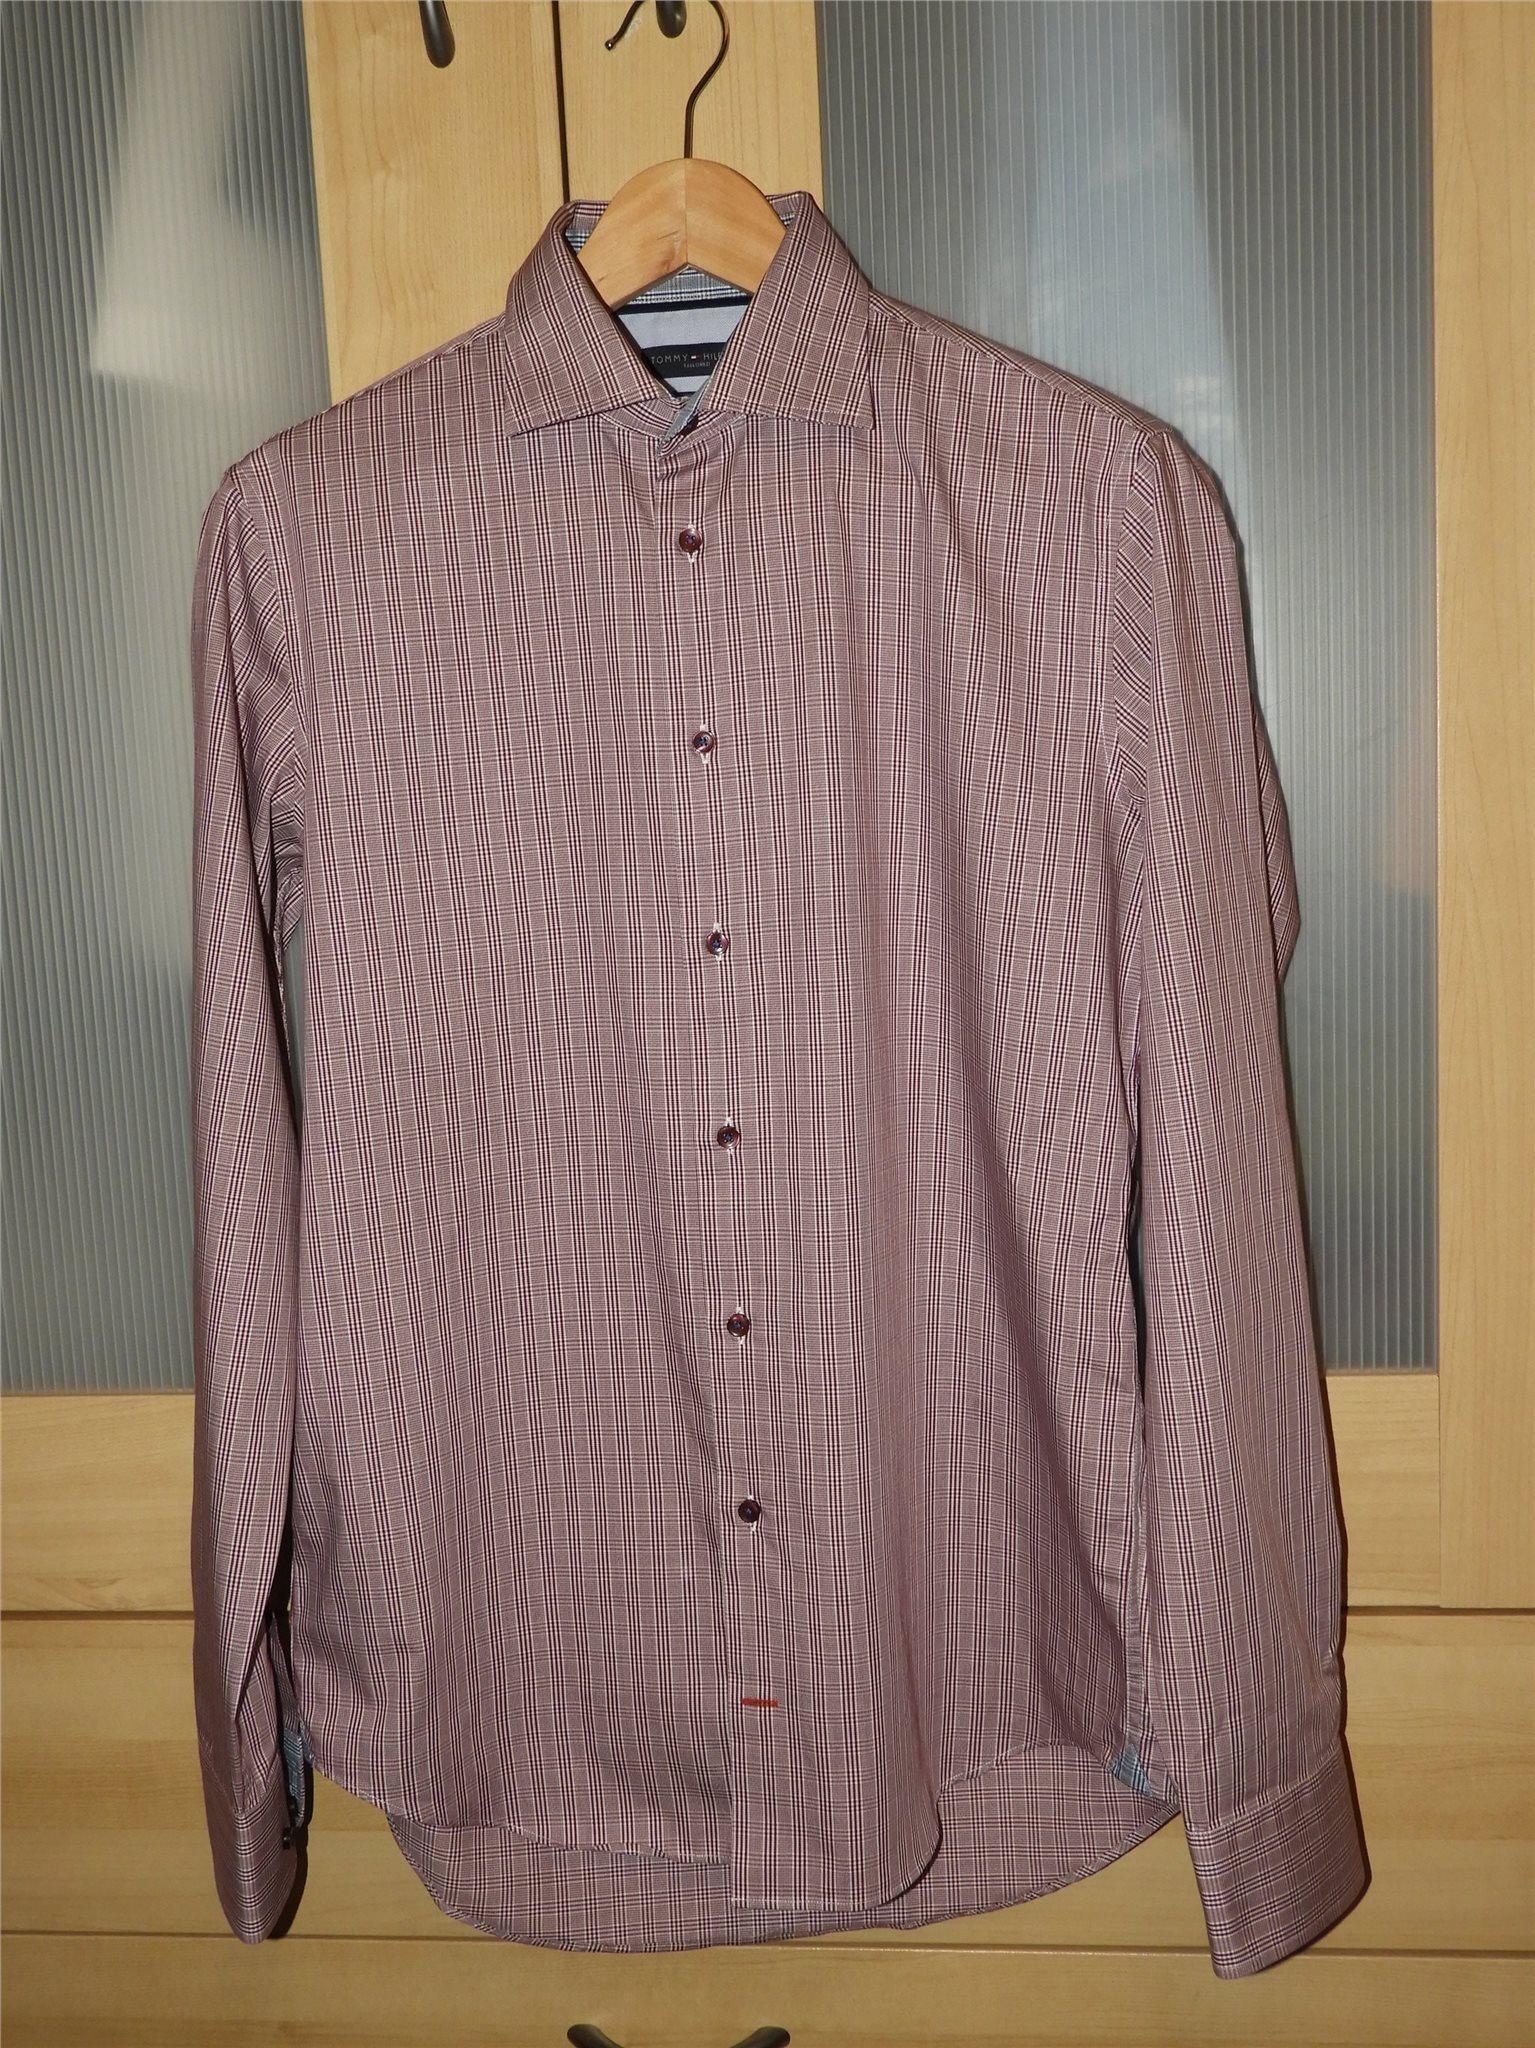 NY  original  TOMMY HILFIGER  skjorta  strl strl strl  38/15 4d0e6f